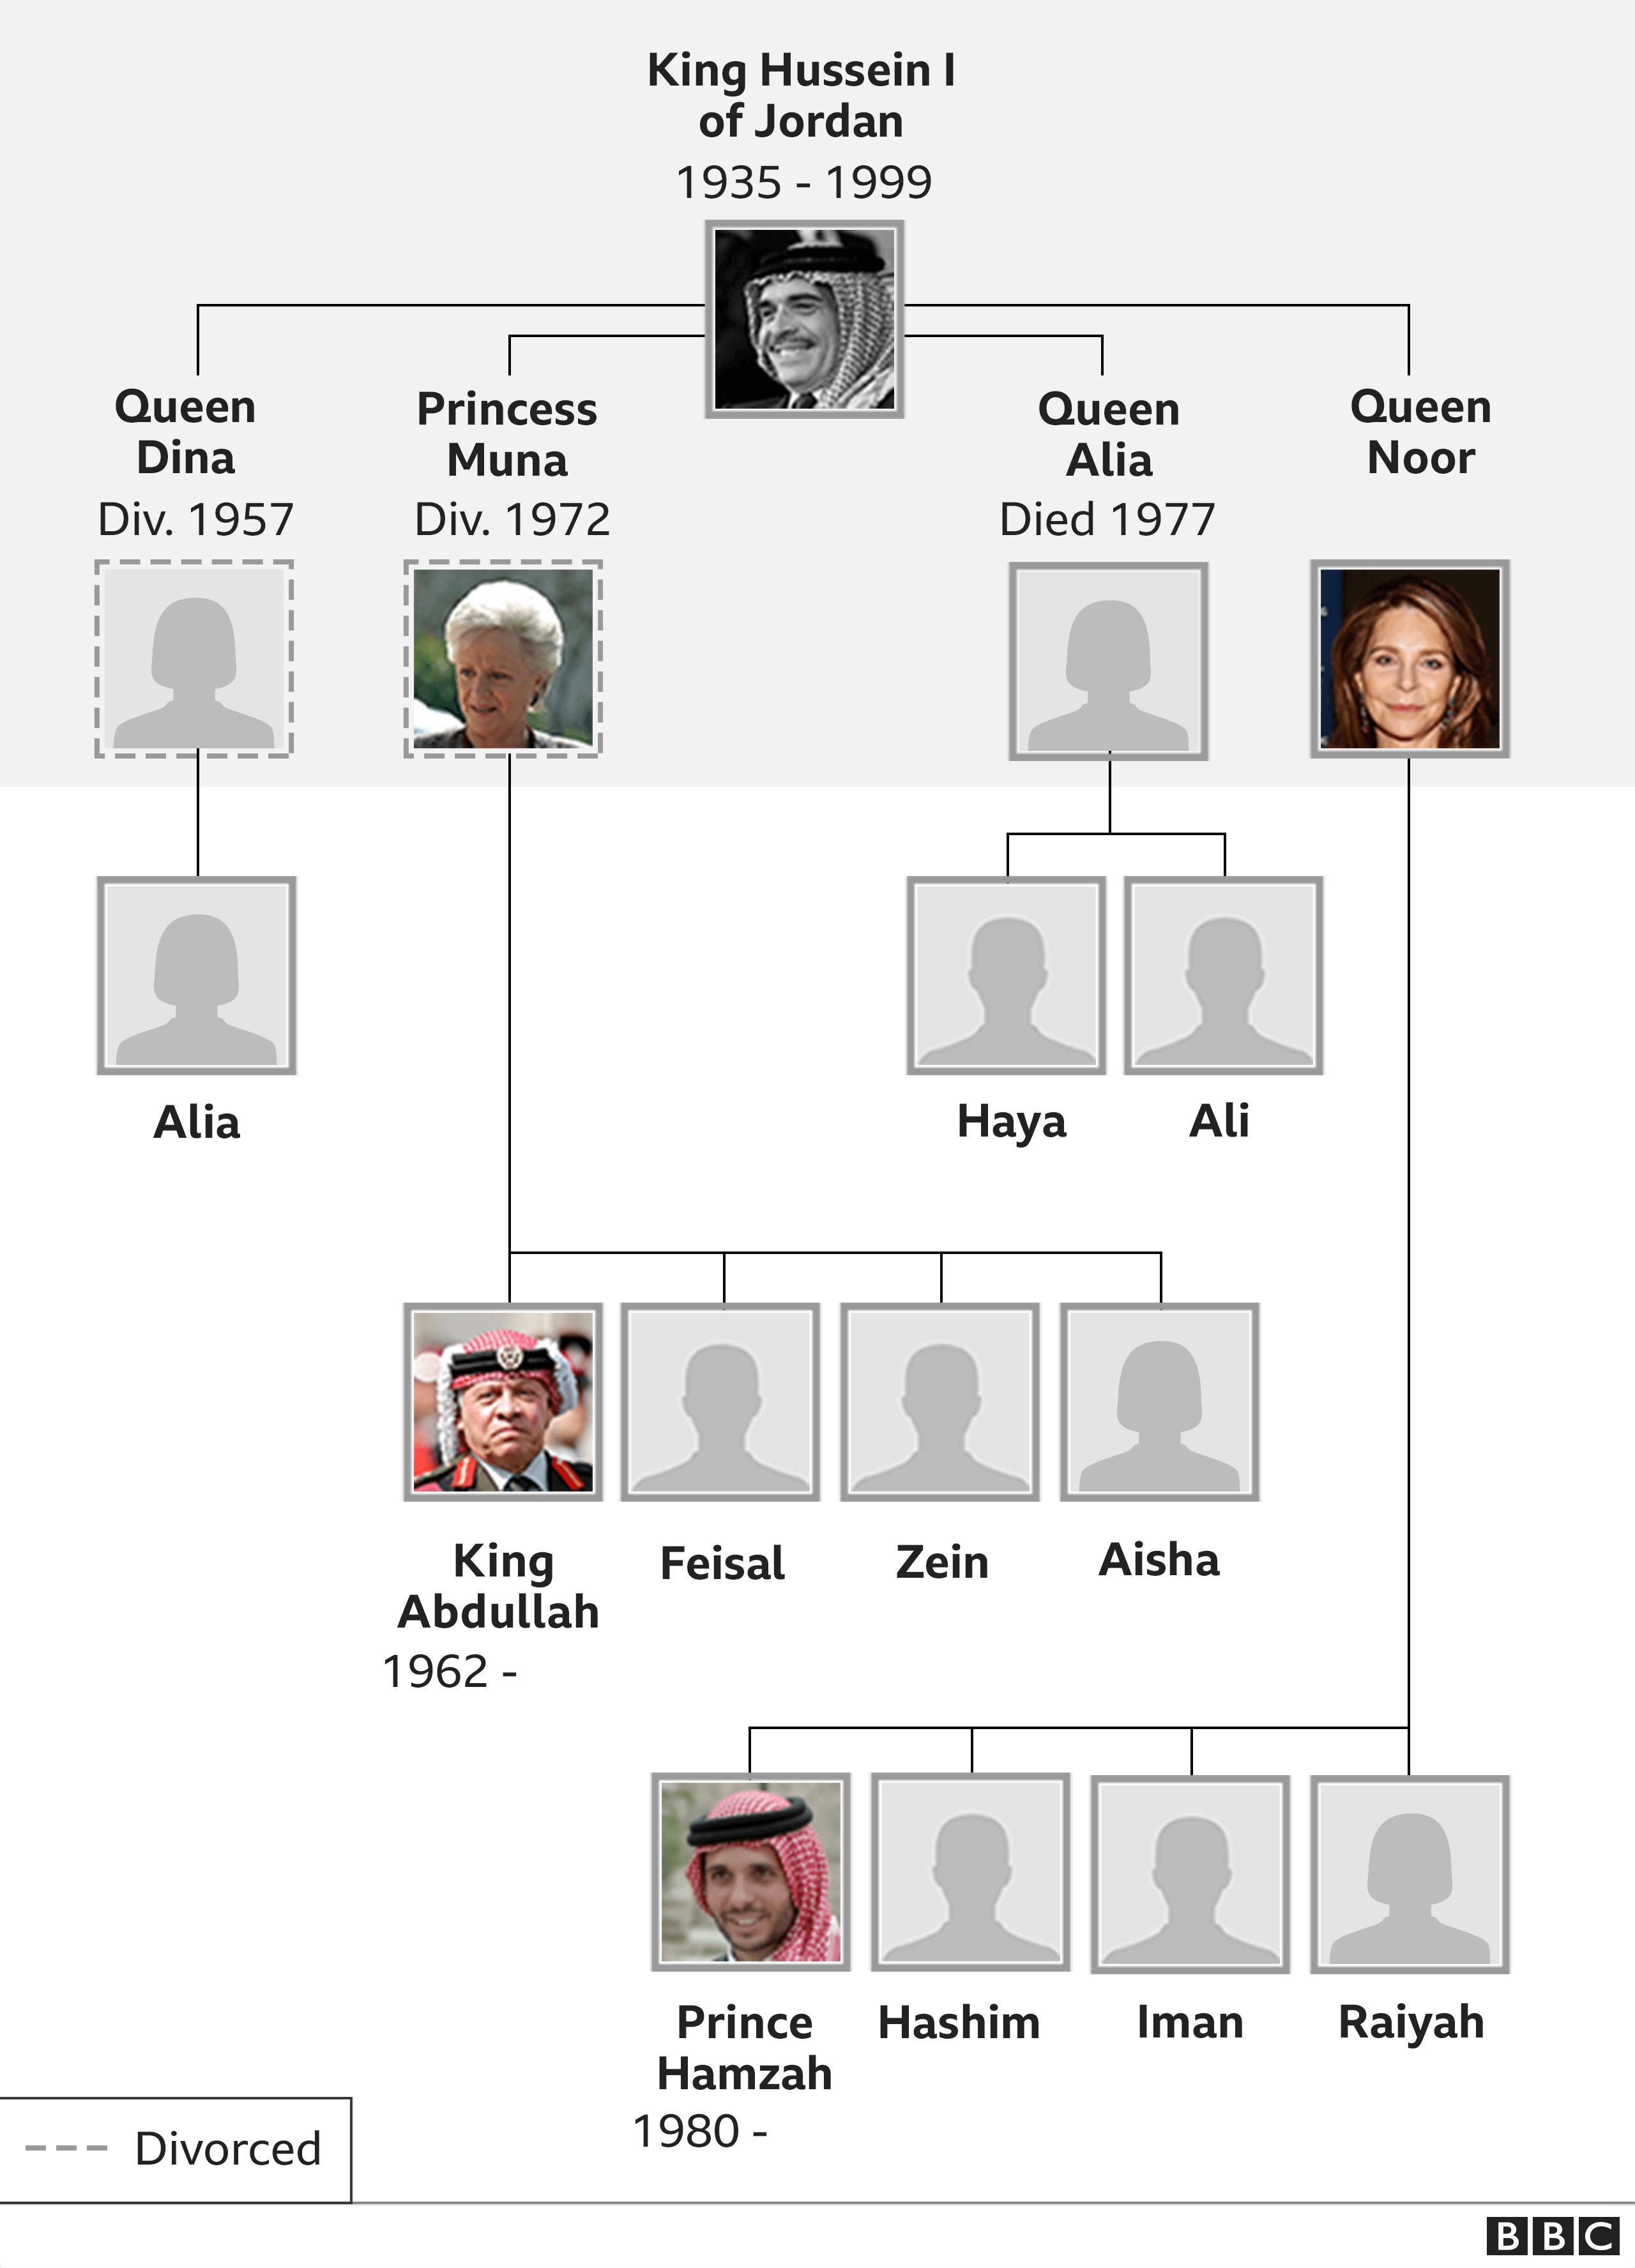 Family tree showing Jordan's royal family